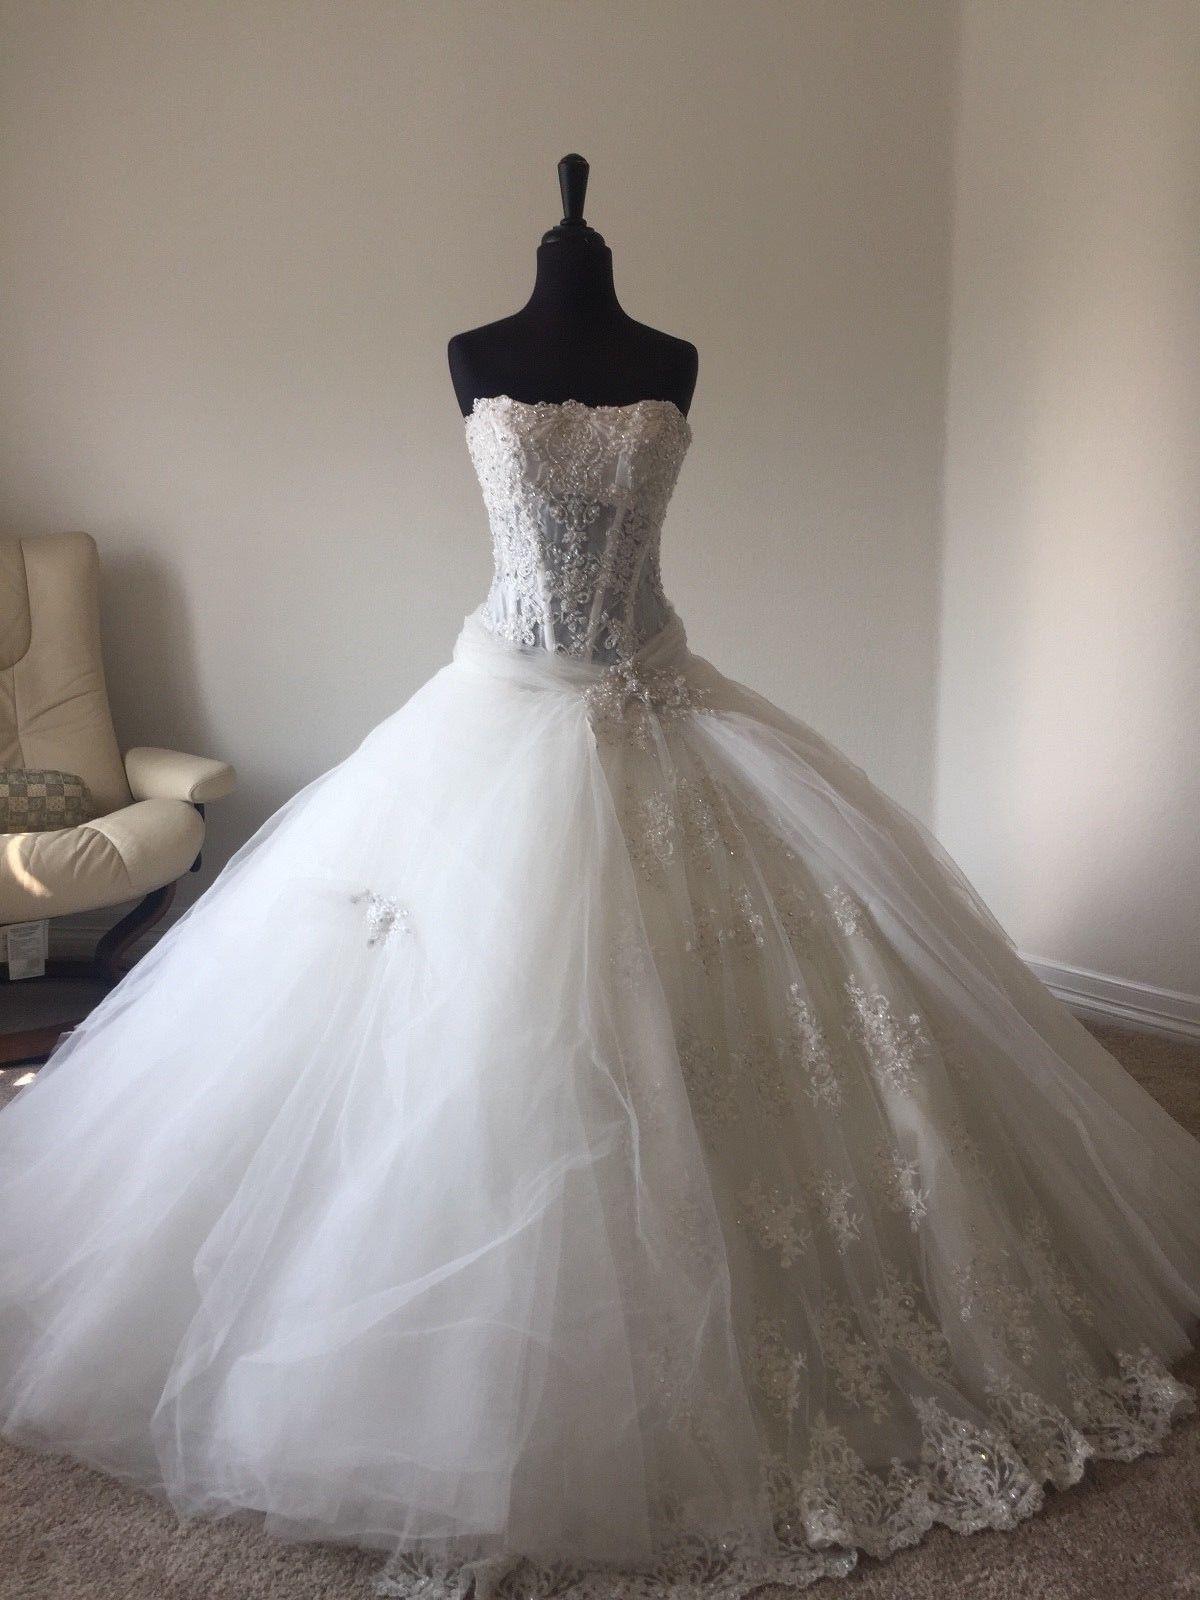 Pnina wedding dress  Pnina Tornai Wedding Dress Custom Tulle and Sworovski Crystal